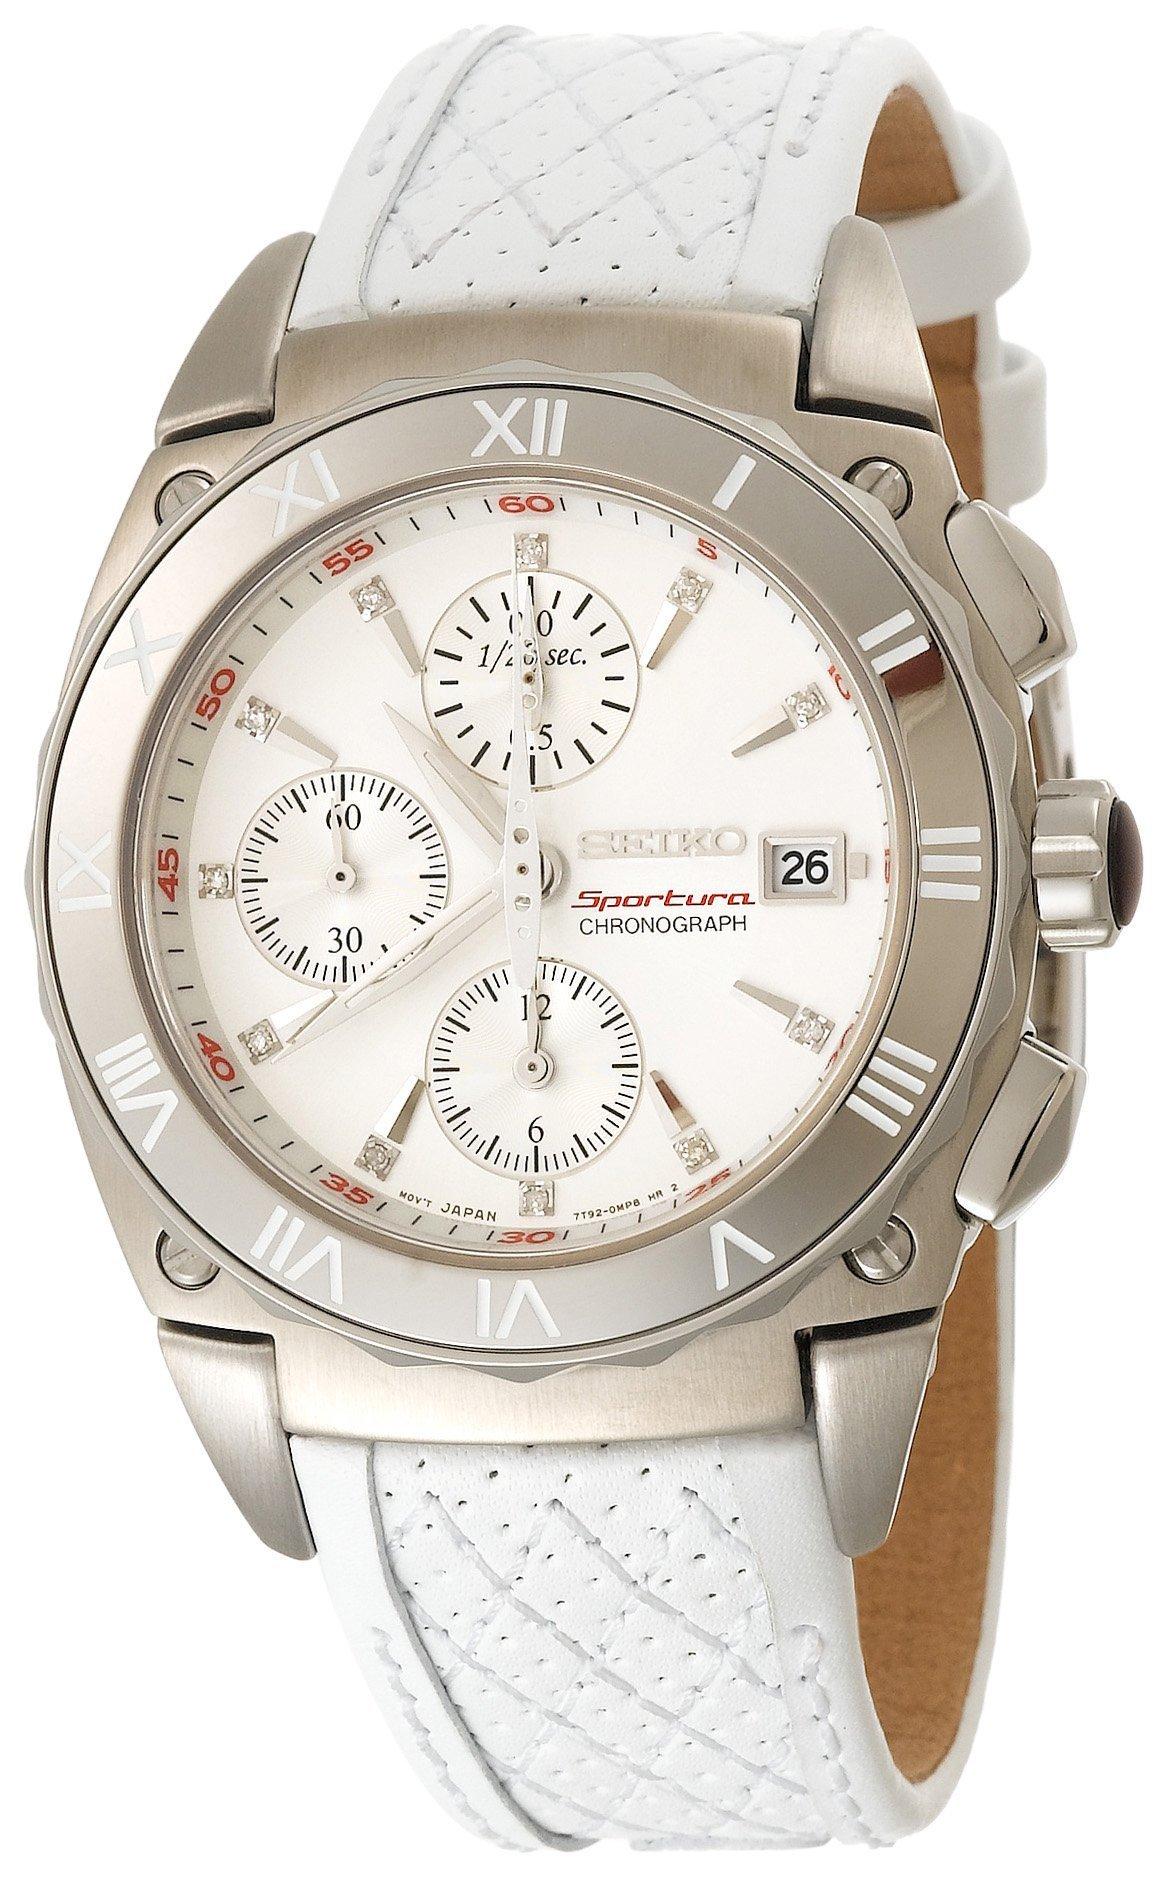 Seiko Women's SNDZ43 Sportura Chronograph Watch